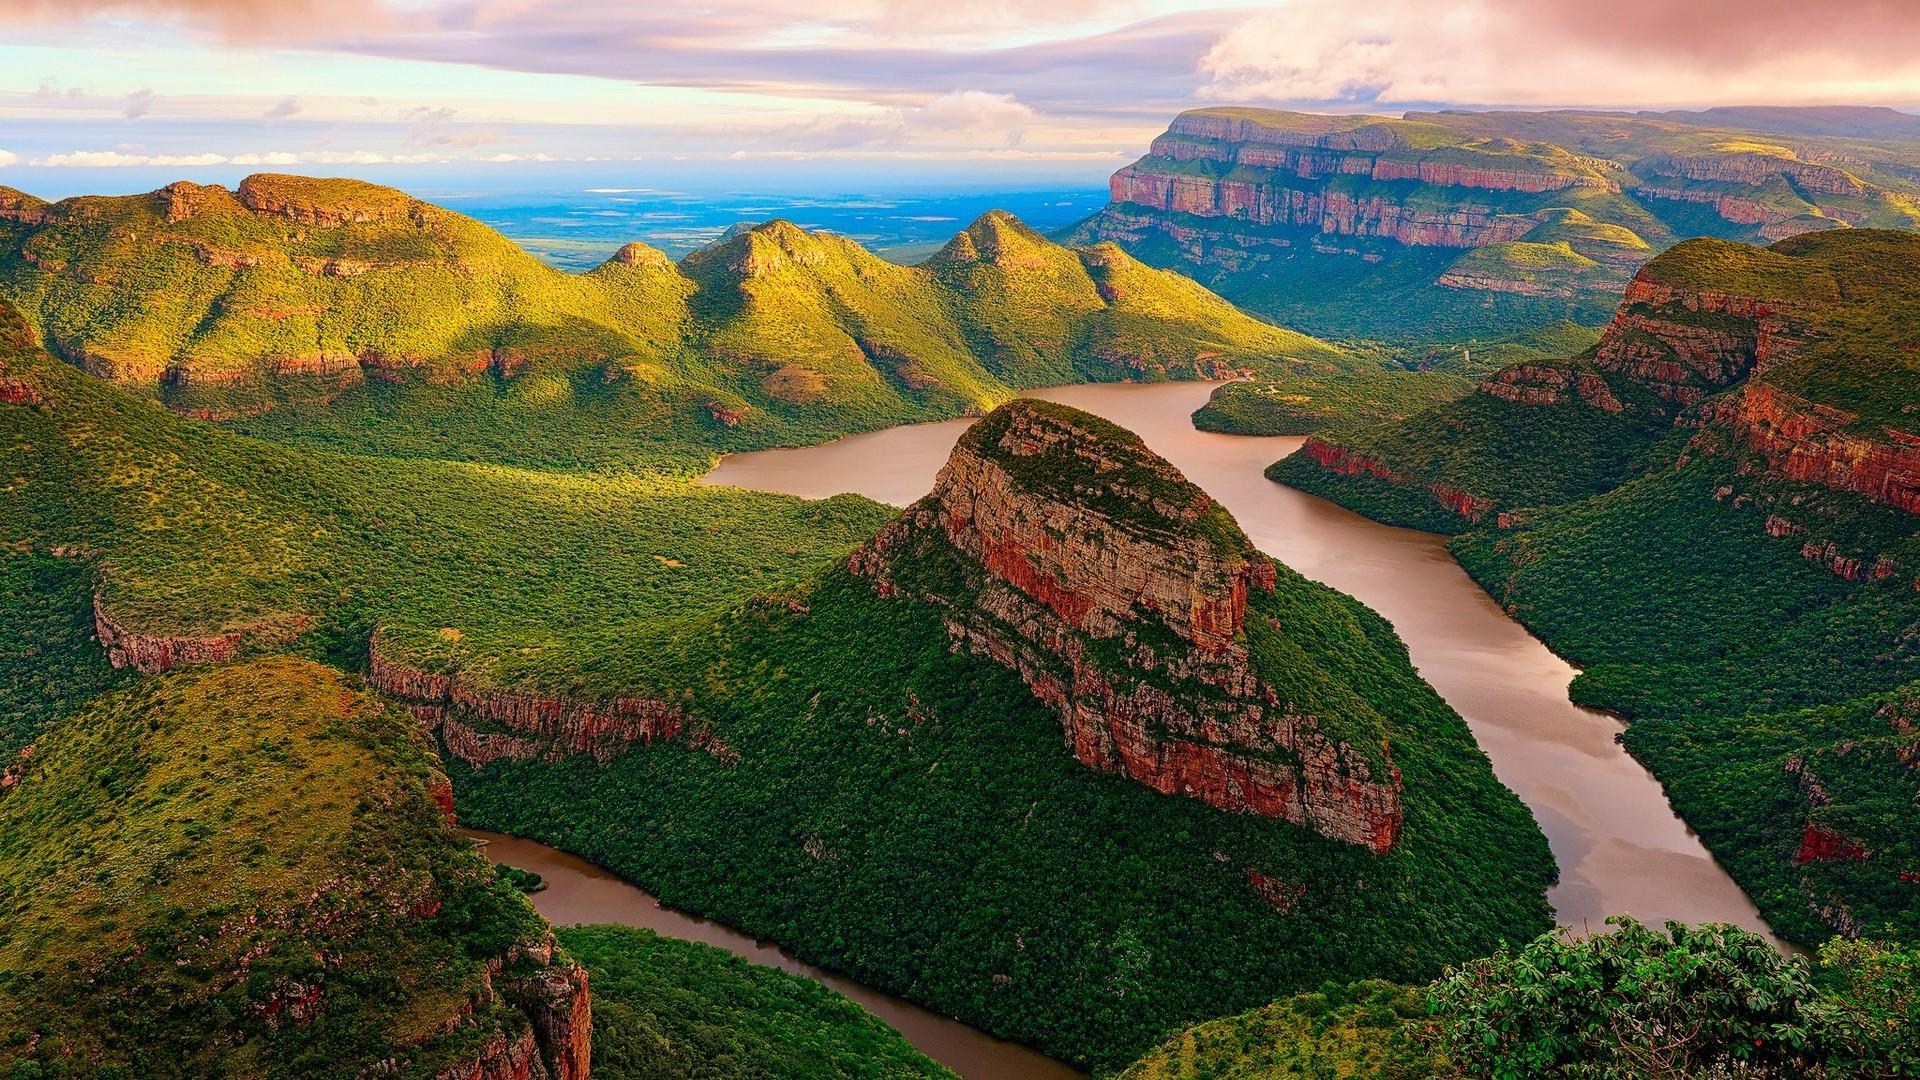 Nature, Landscape, Mountain, Trees, Clouds, Bird's - High Res River Wallpaper Bird's Eye View , HD Wallpaper & Backgrounds